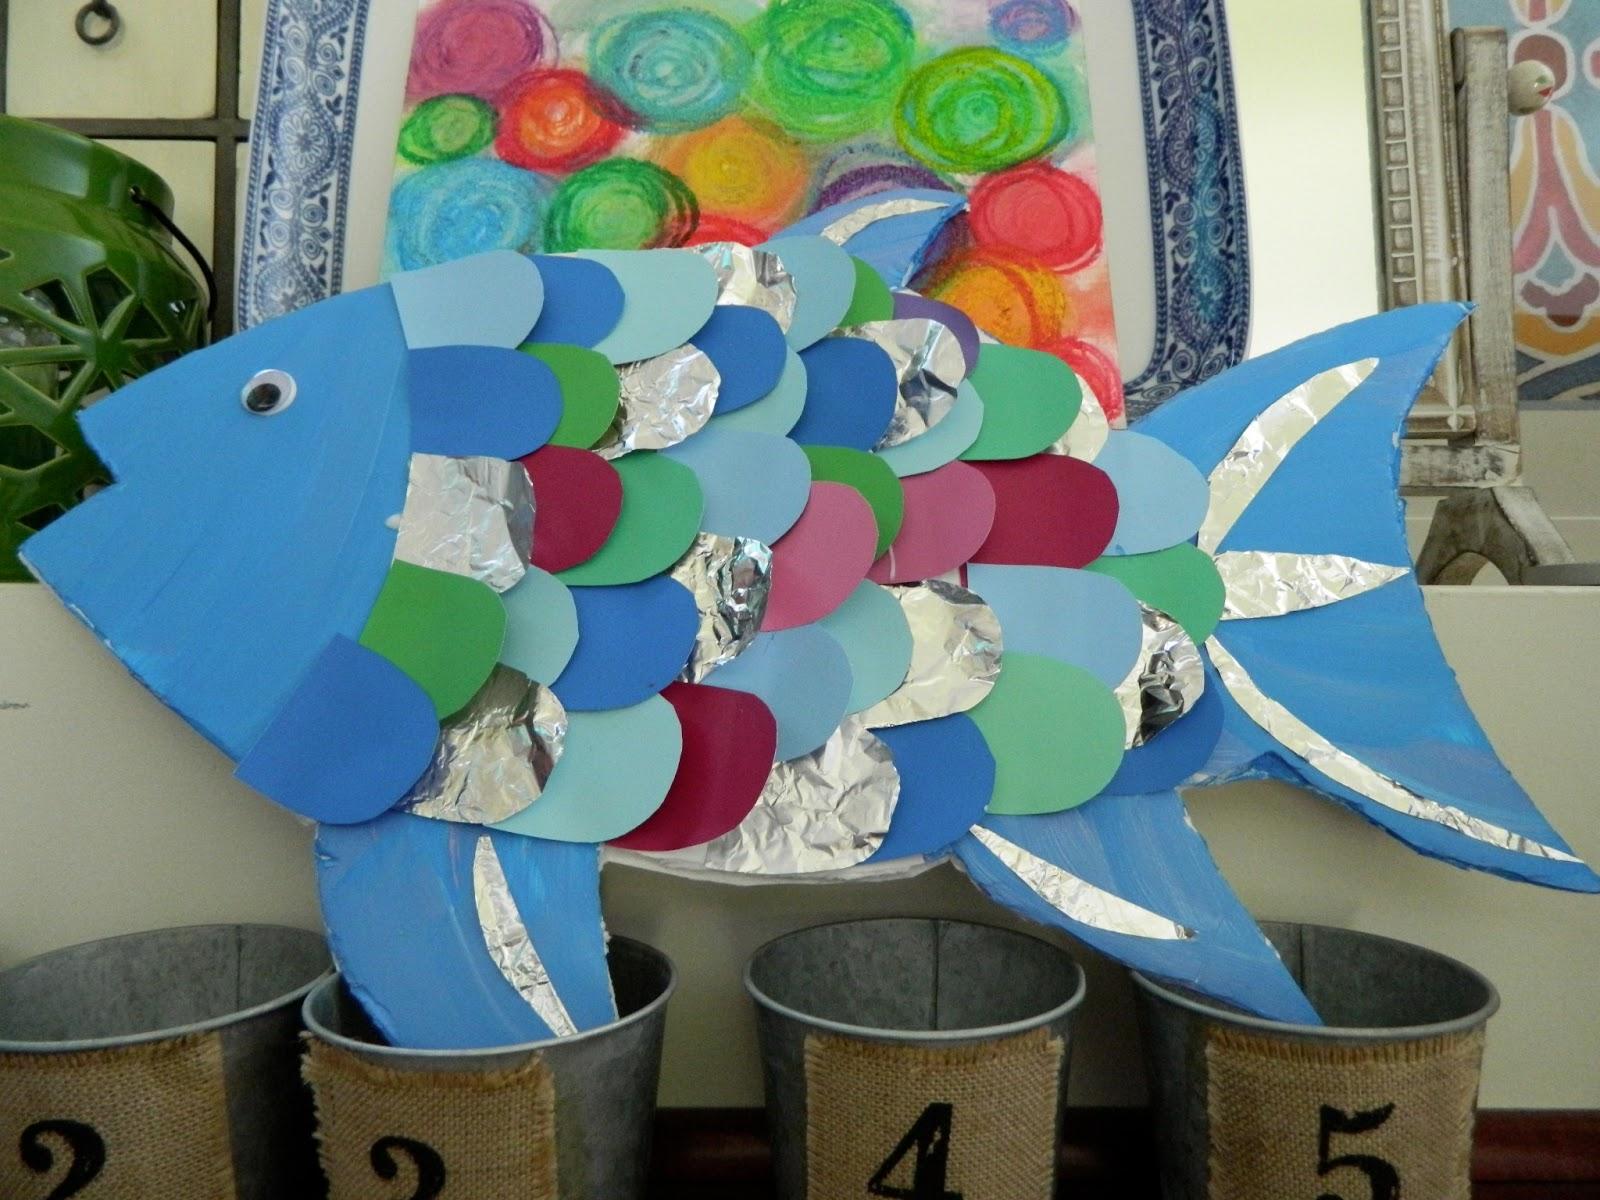 The Vintage Umbrella Rainbow Fish